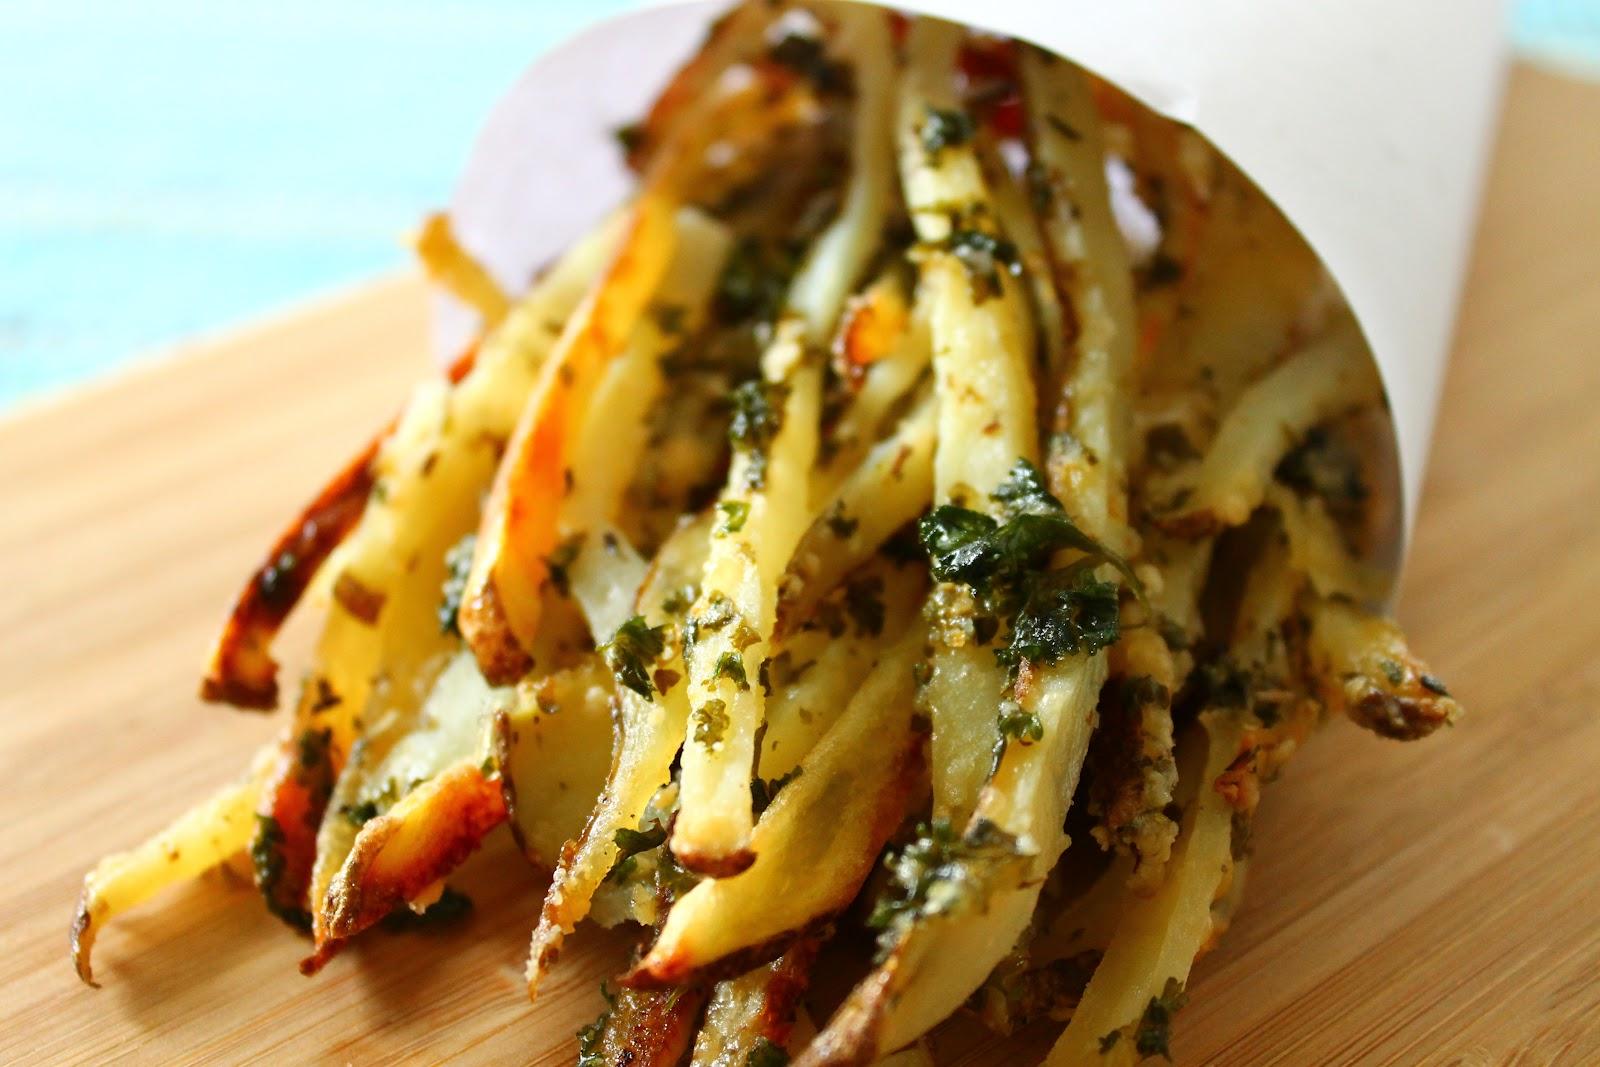 Italian Fries {oven baked}